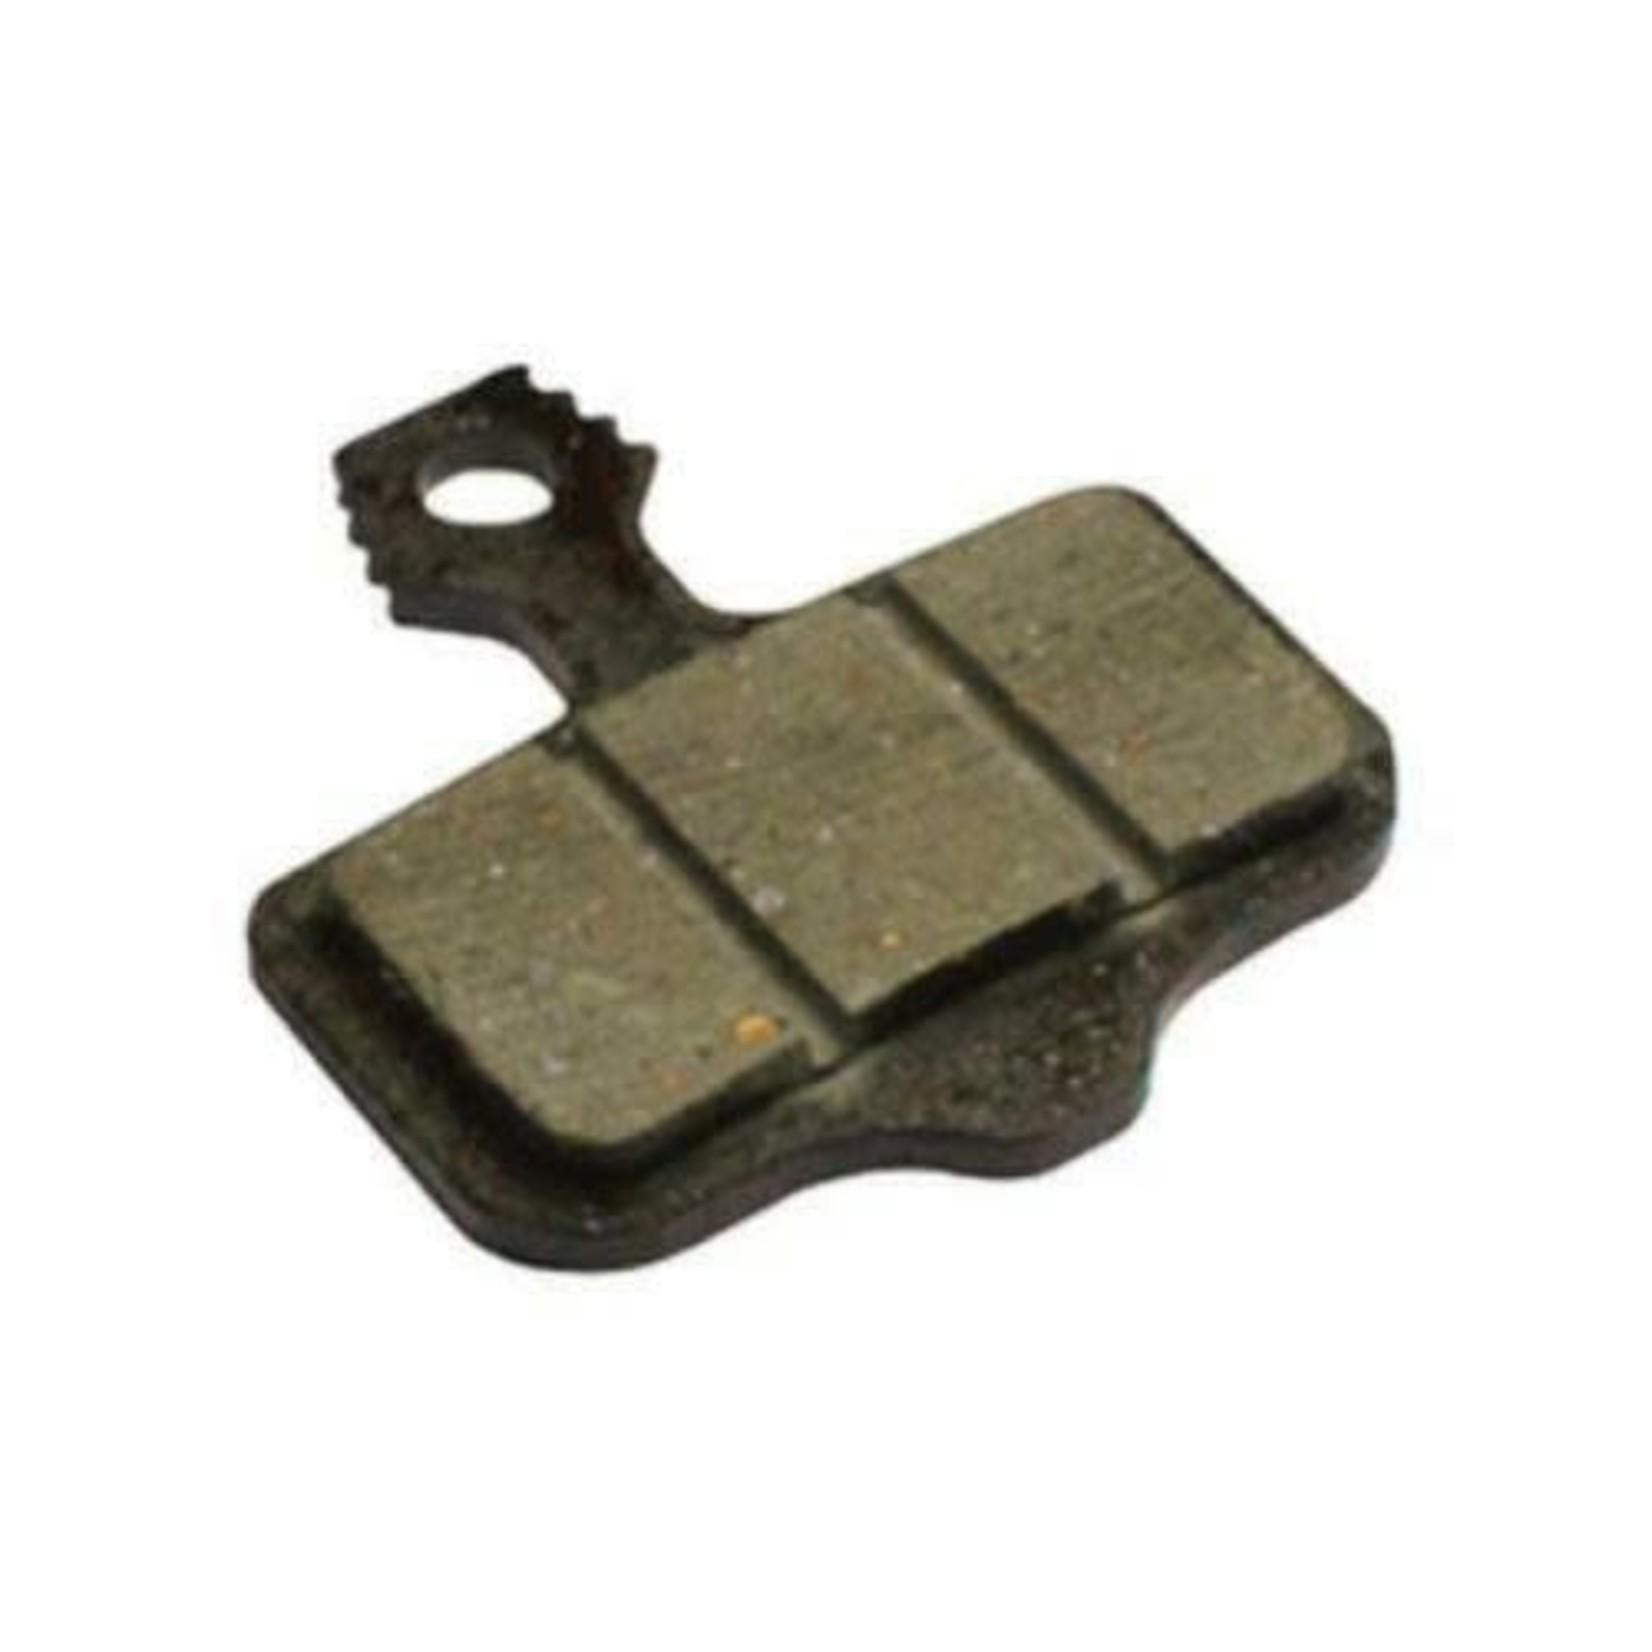 ULTRACYCLE KHS ULTRACYCLE Avid/SCRAM Disc Brake Pads